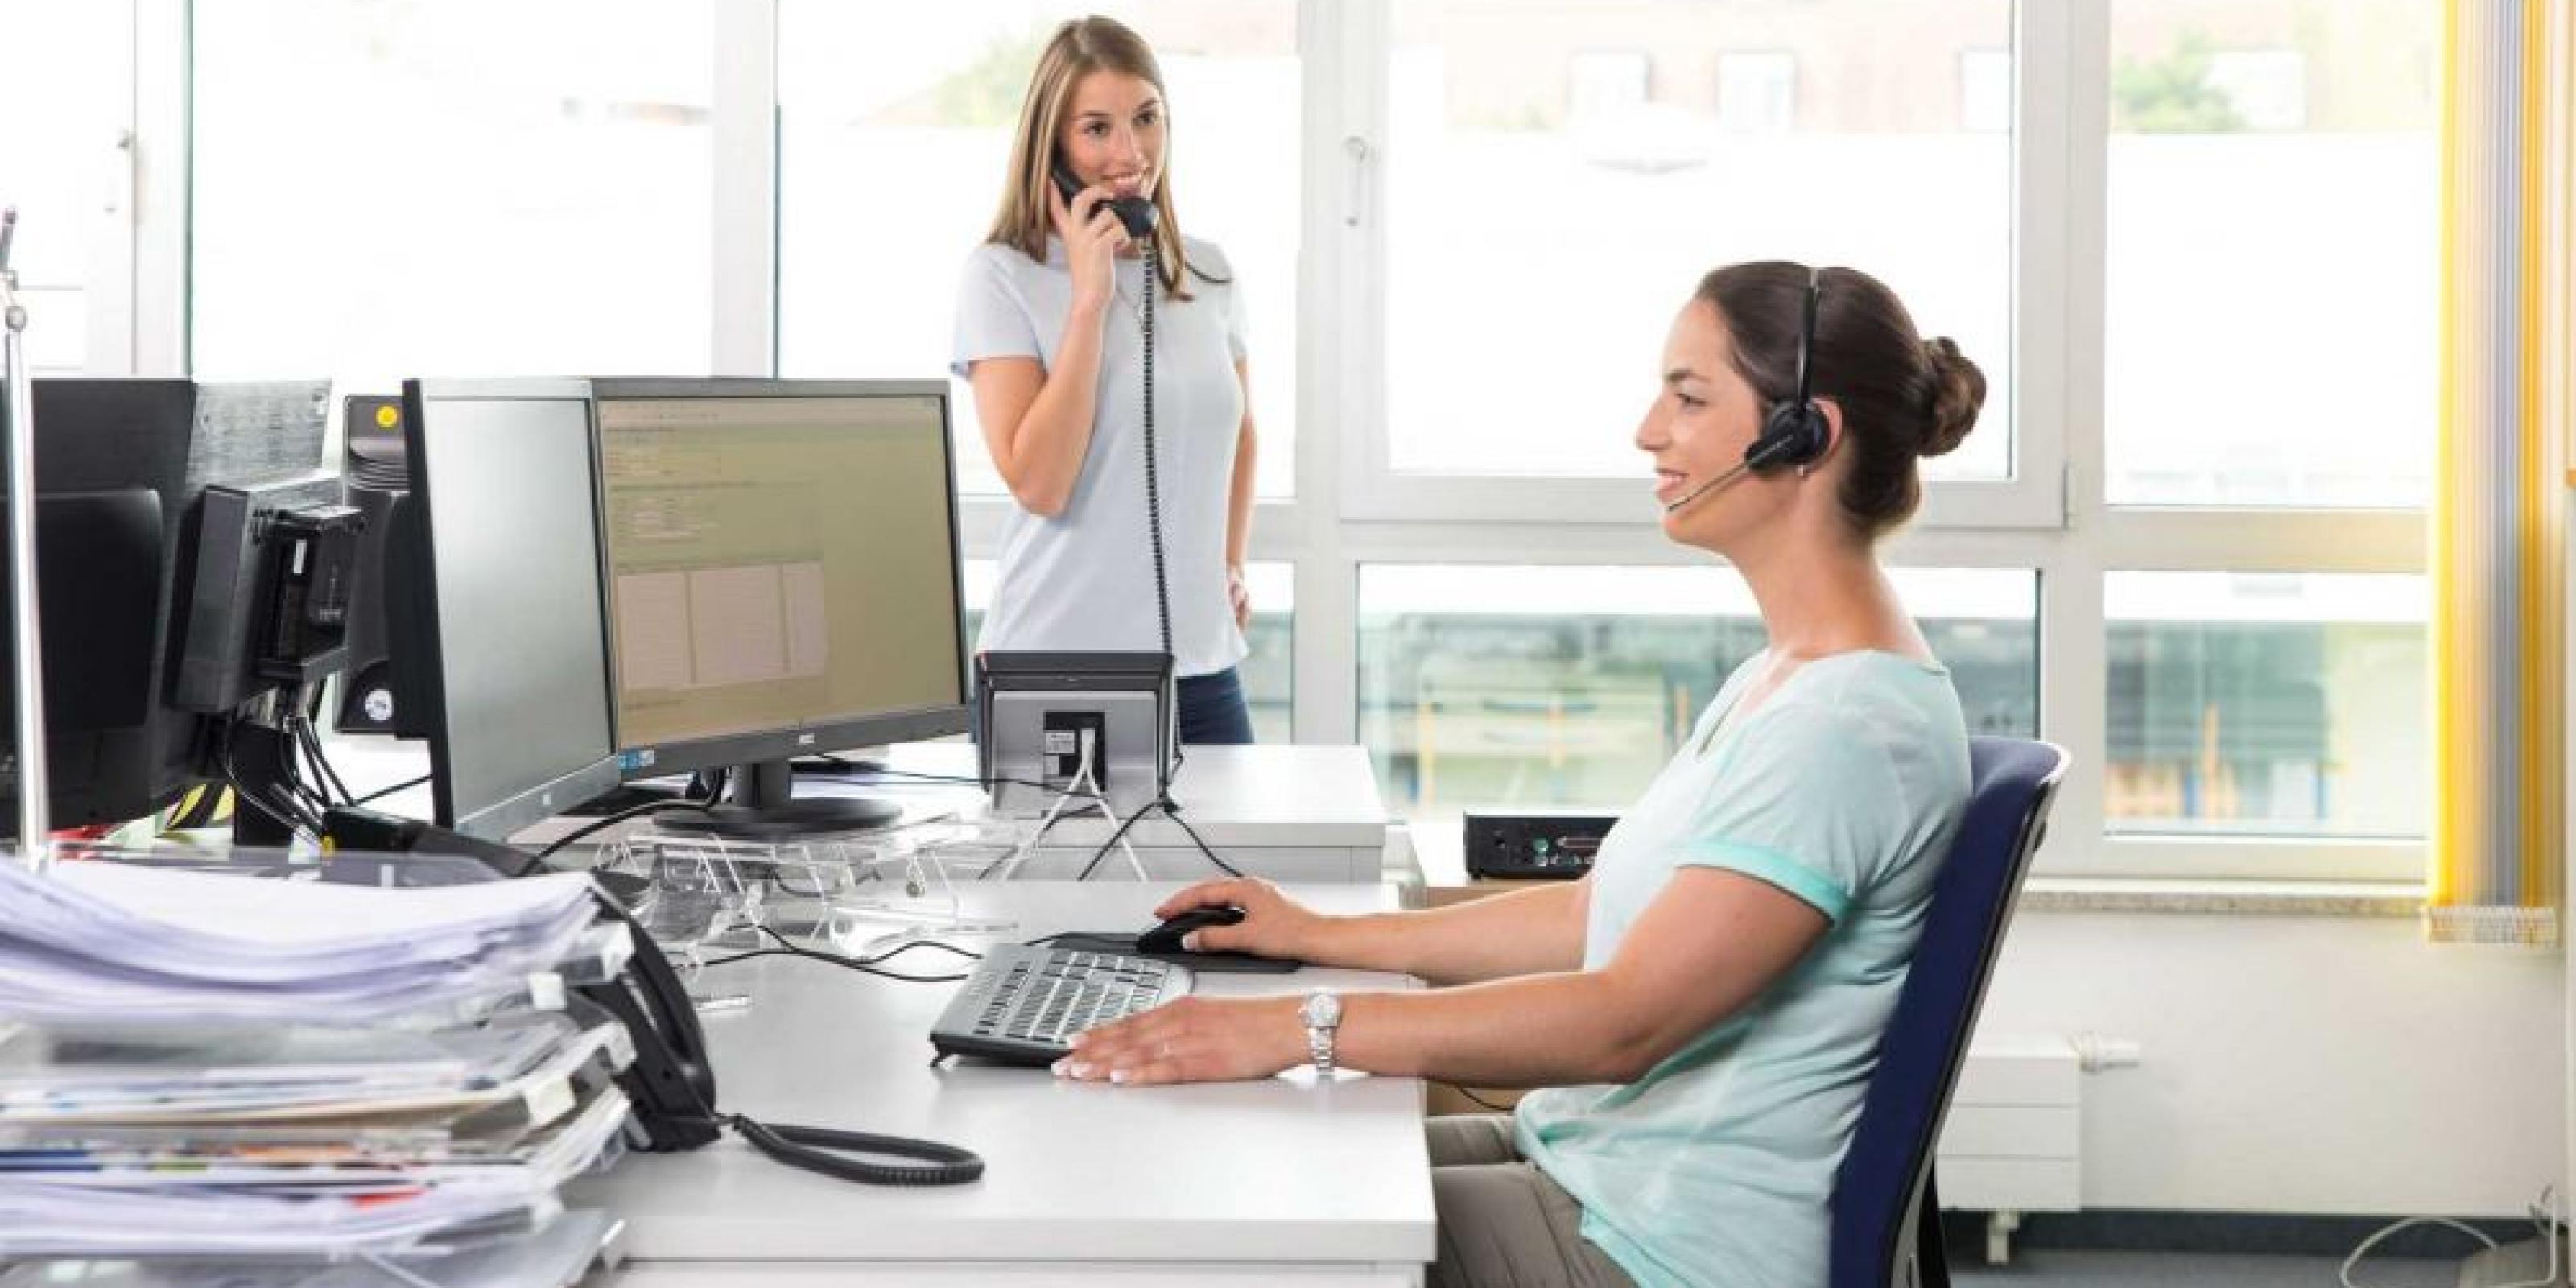 Truma employees answering the service telephone